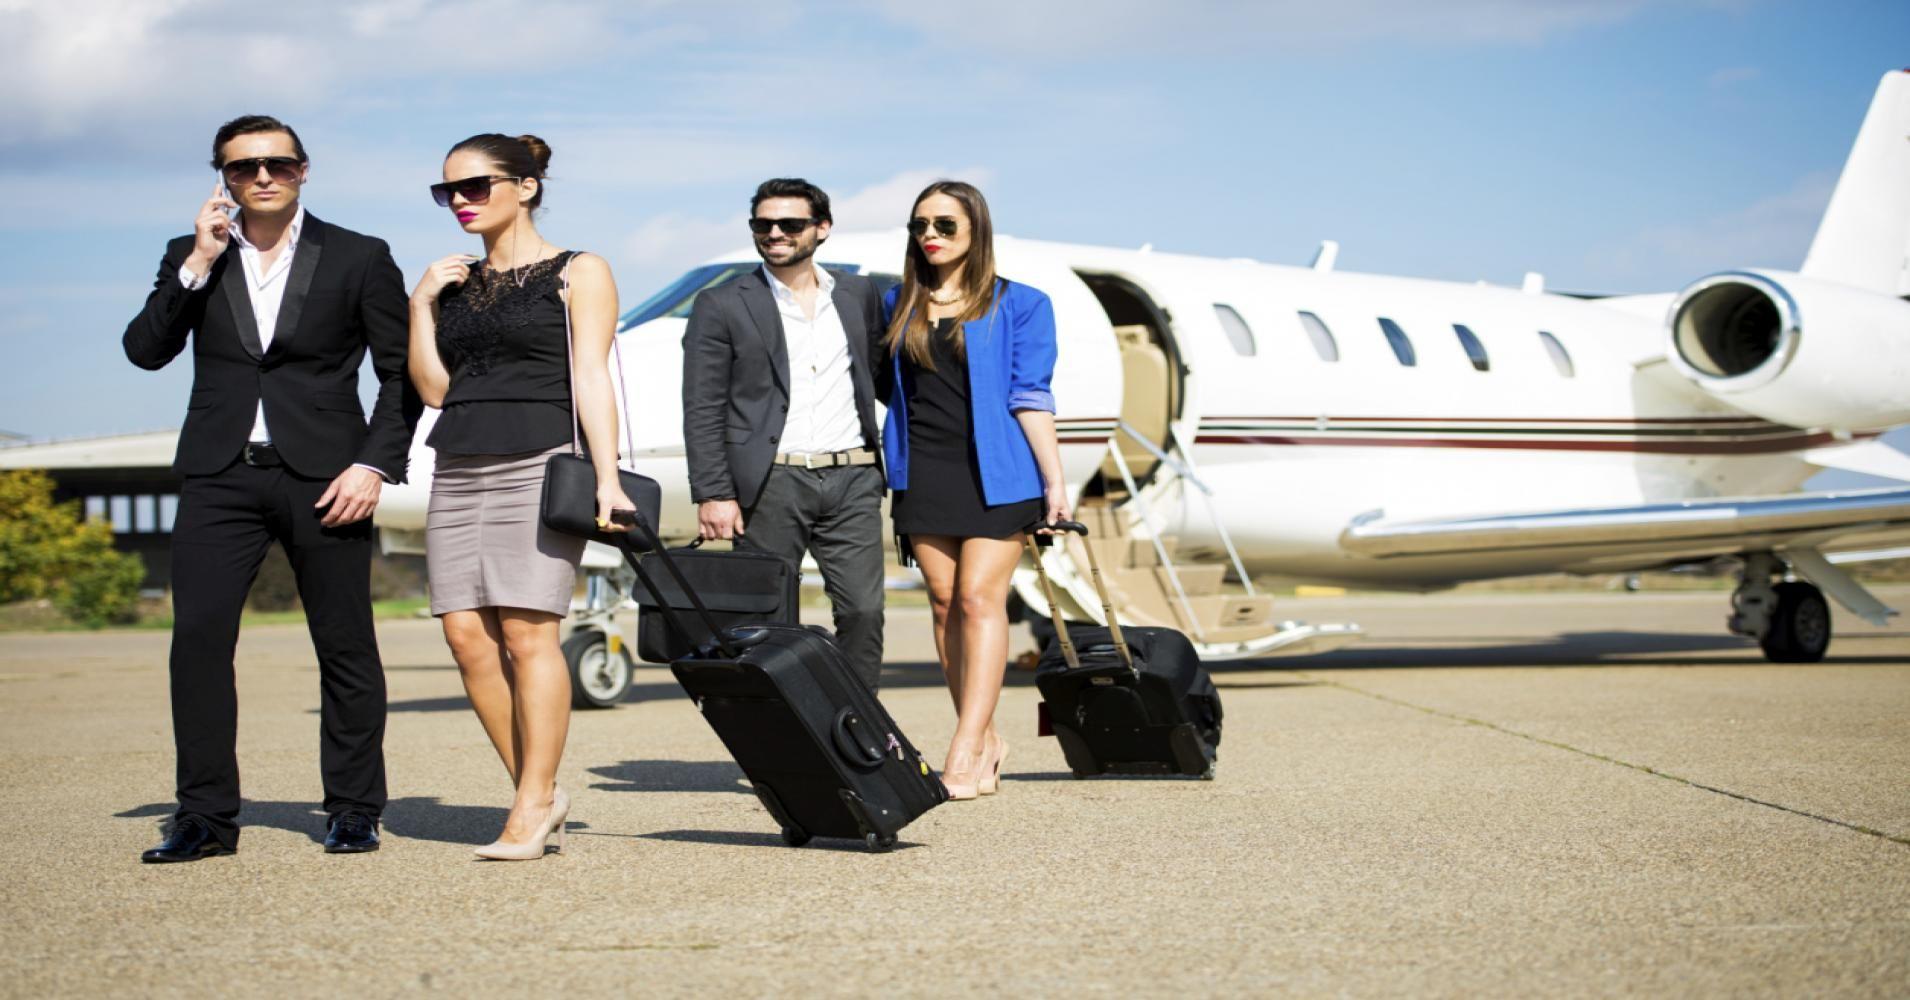 Flightpath on Private jet, Luxury lifestyle women, Jet